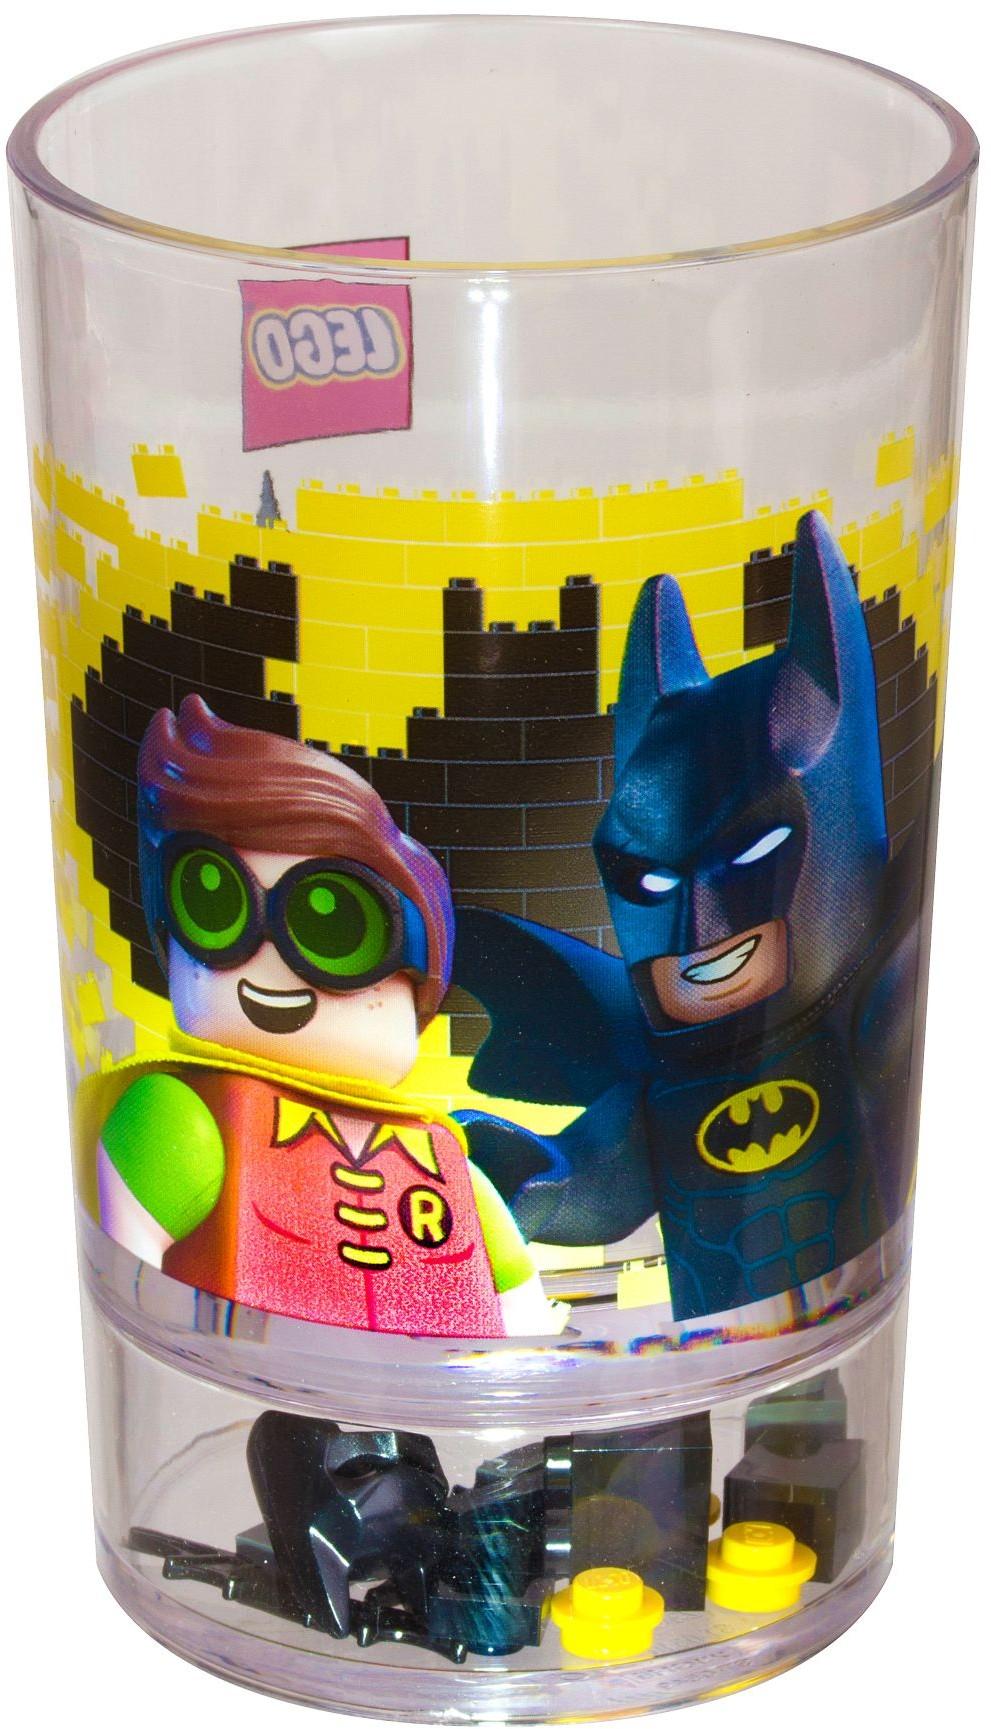 Tagged Bat Family Gear Brickset Lego Set Guide And Database